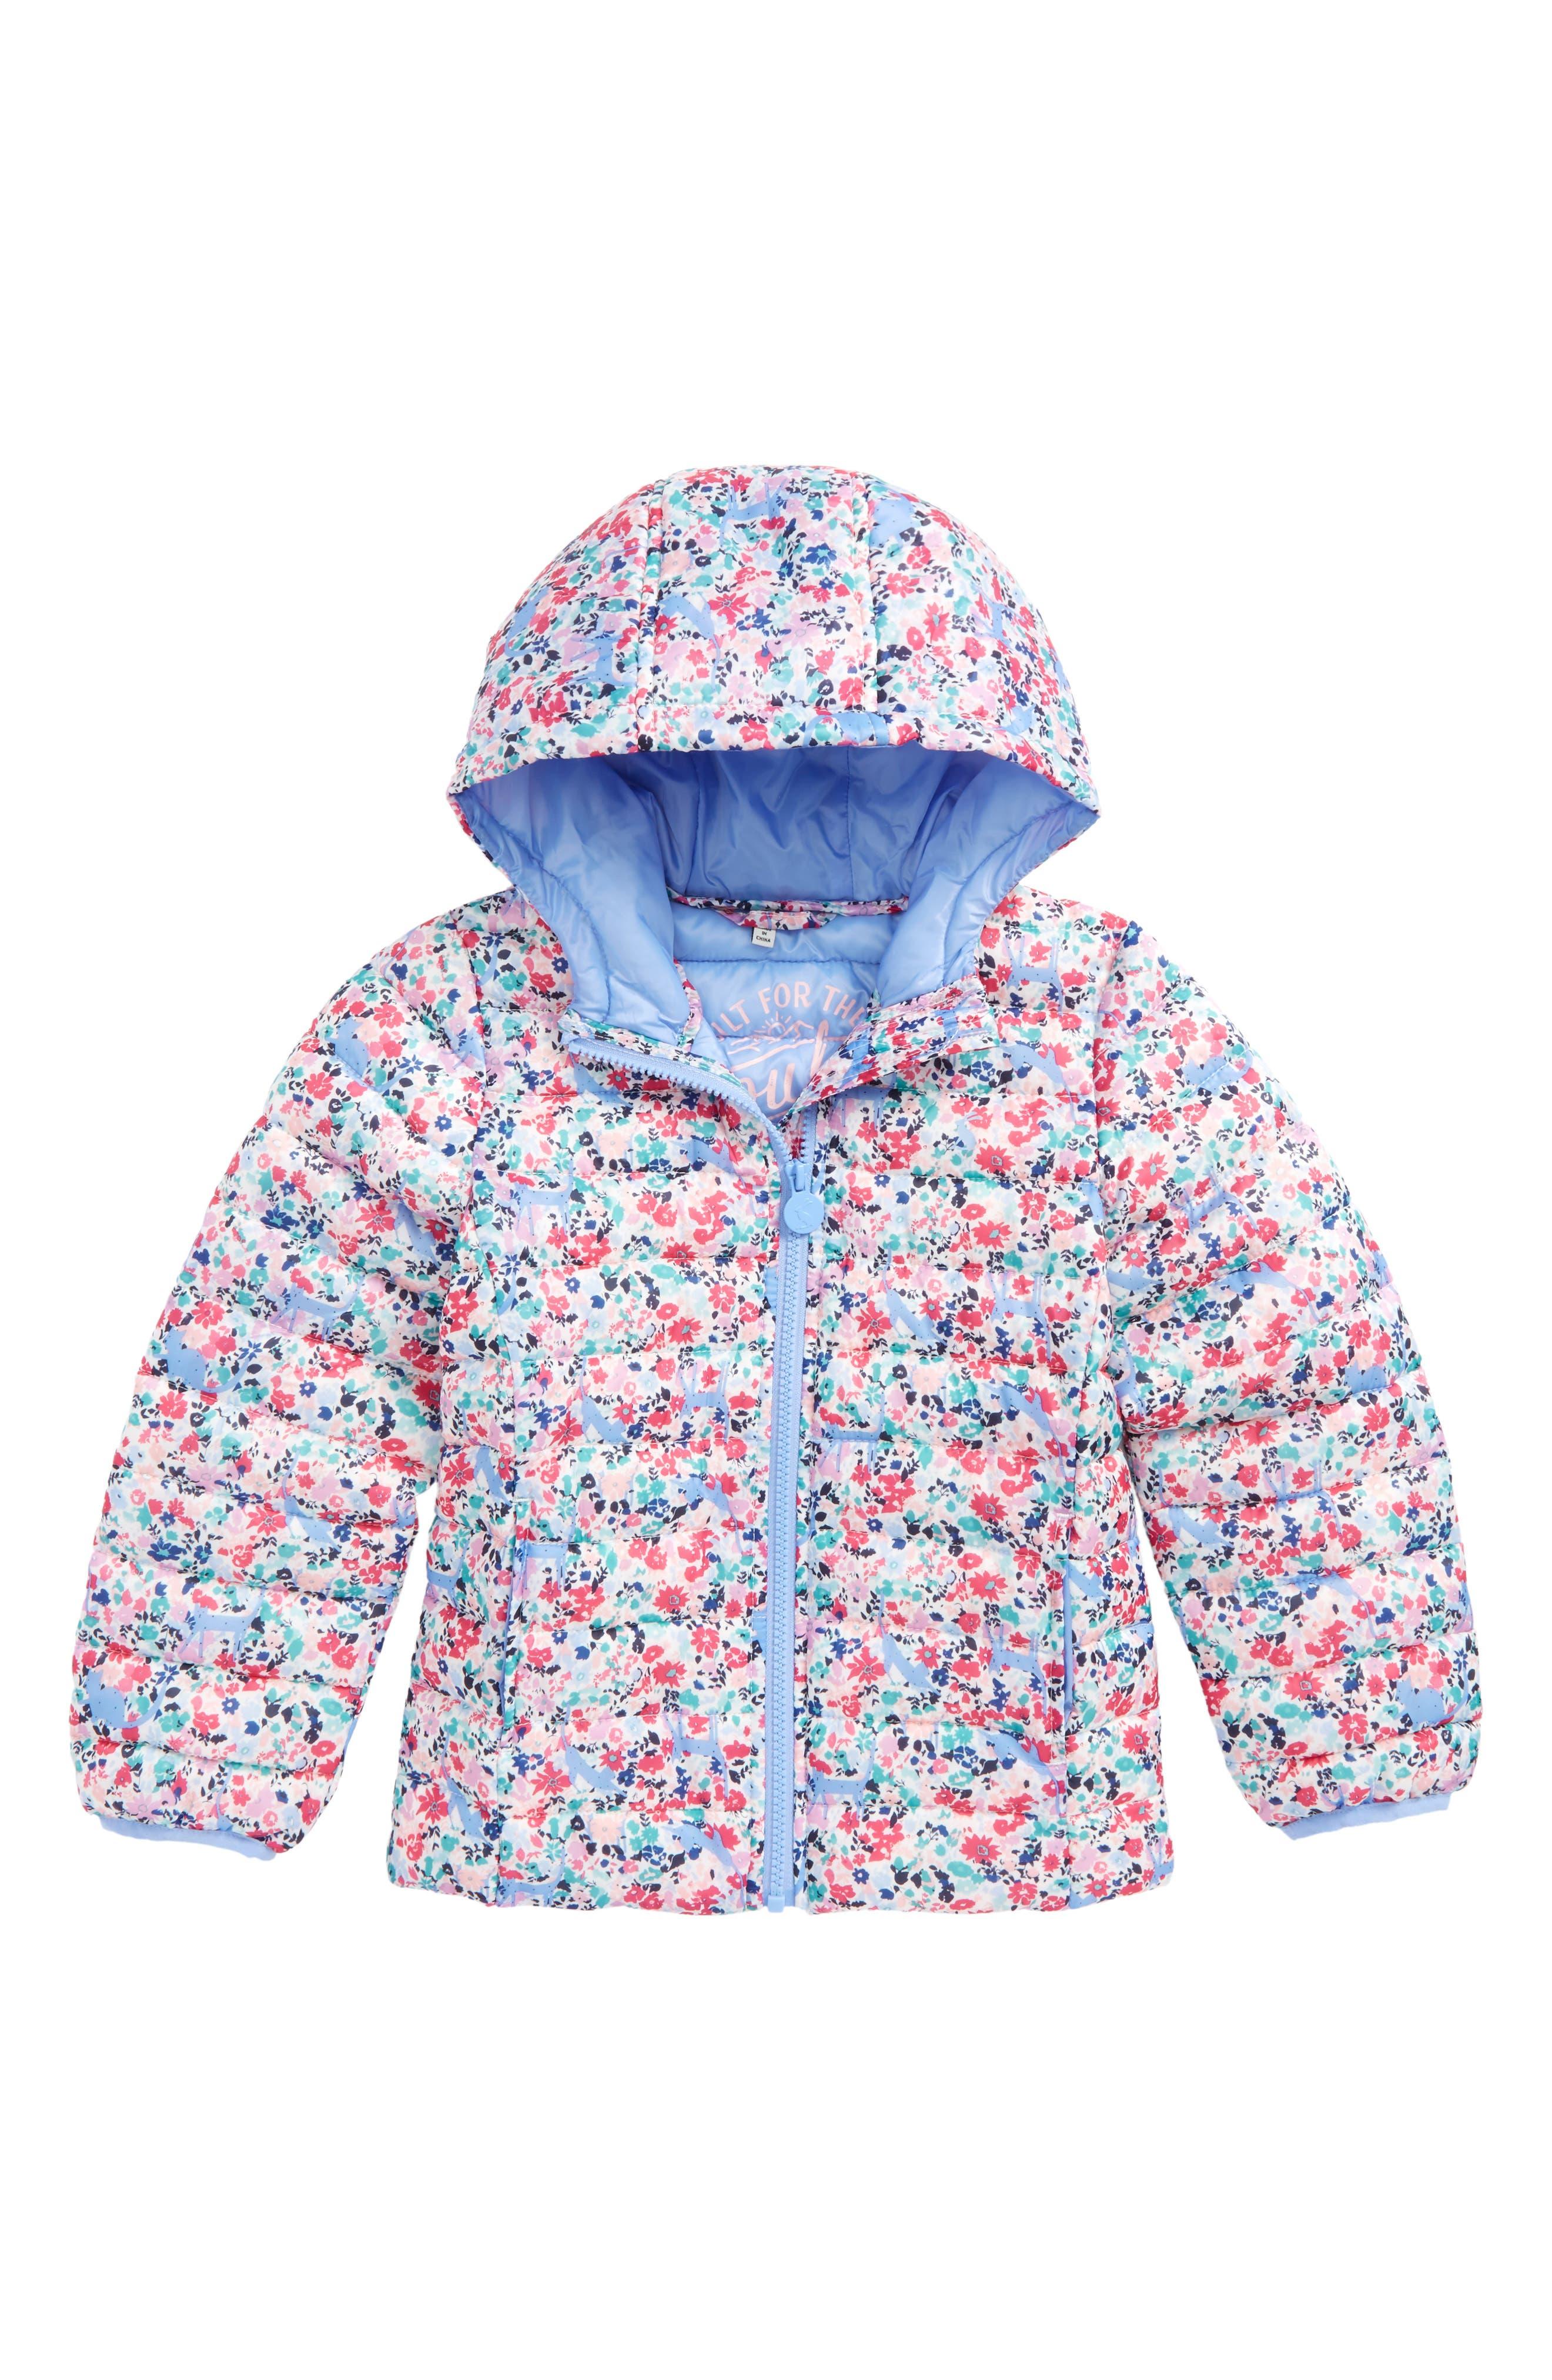 Main Image - Joules Print Packaway Hooded Jacket (Toddler Girls & Little Girls)